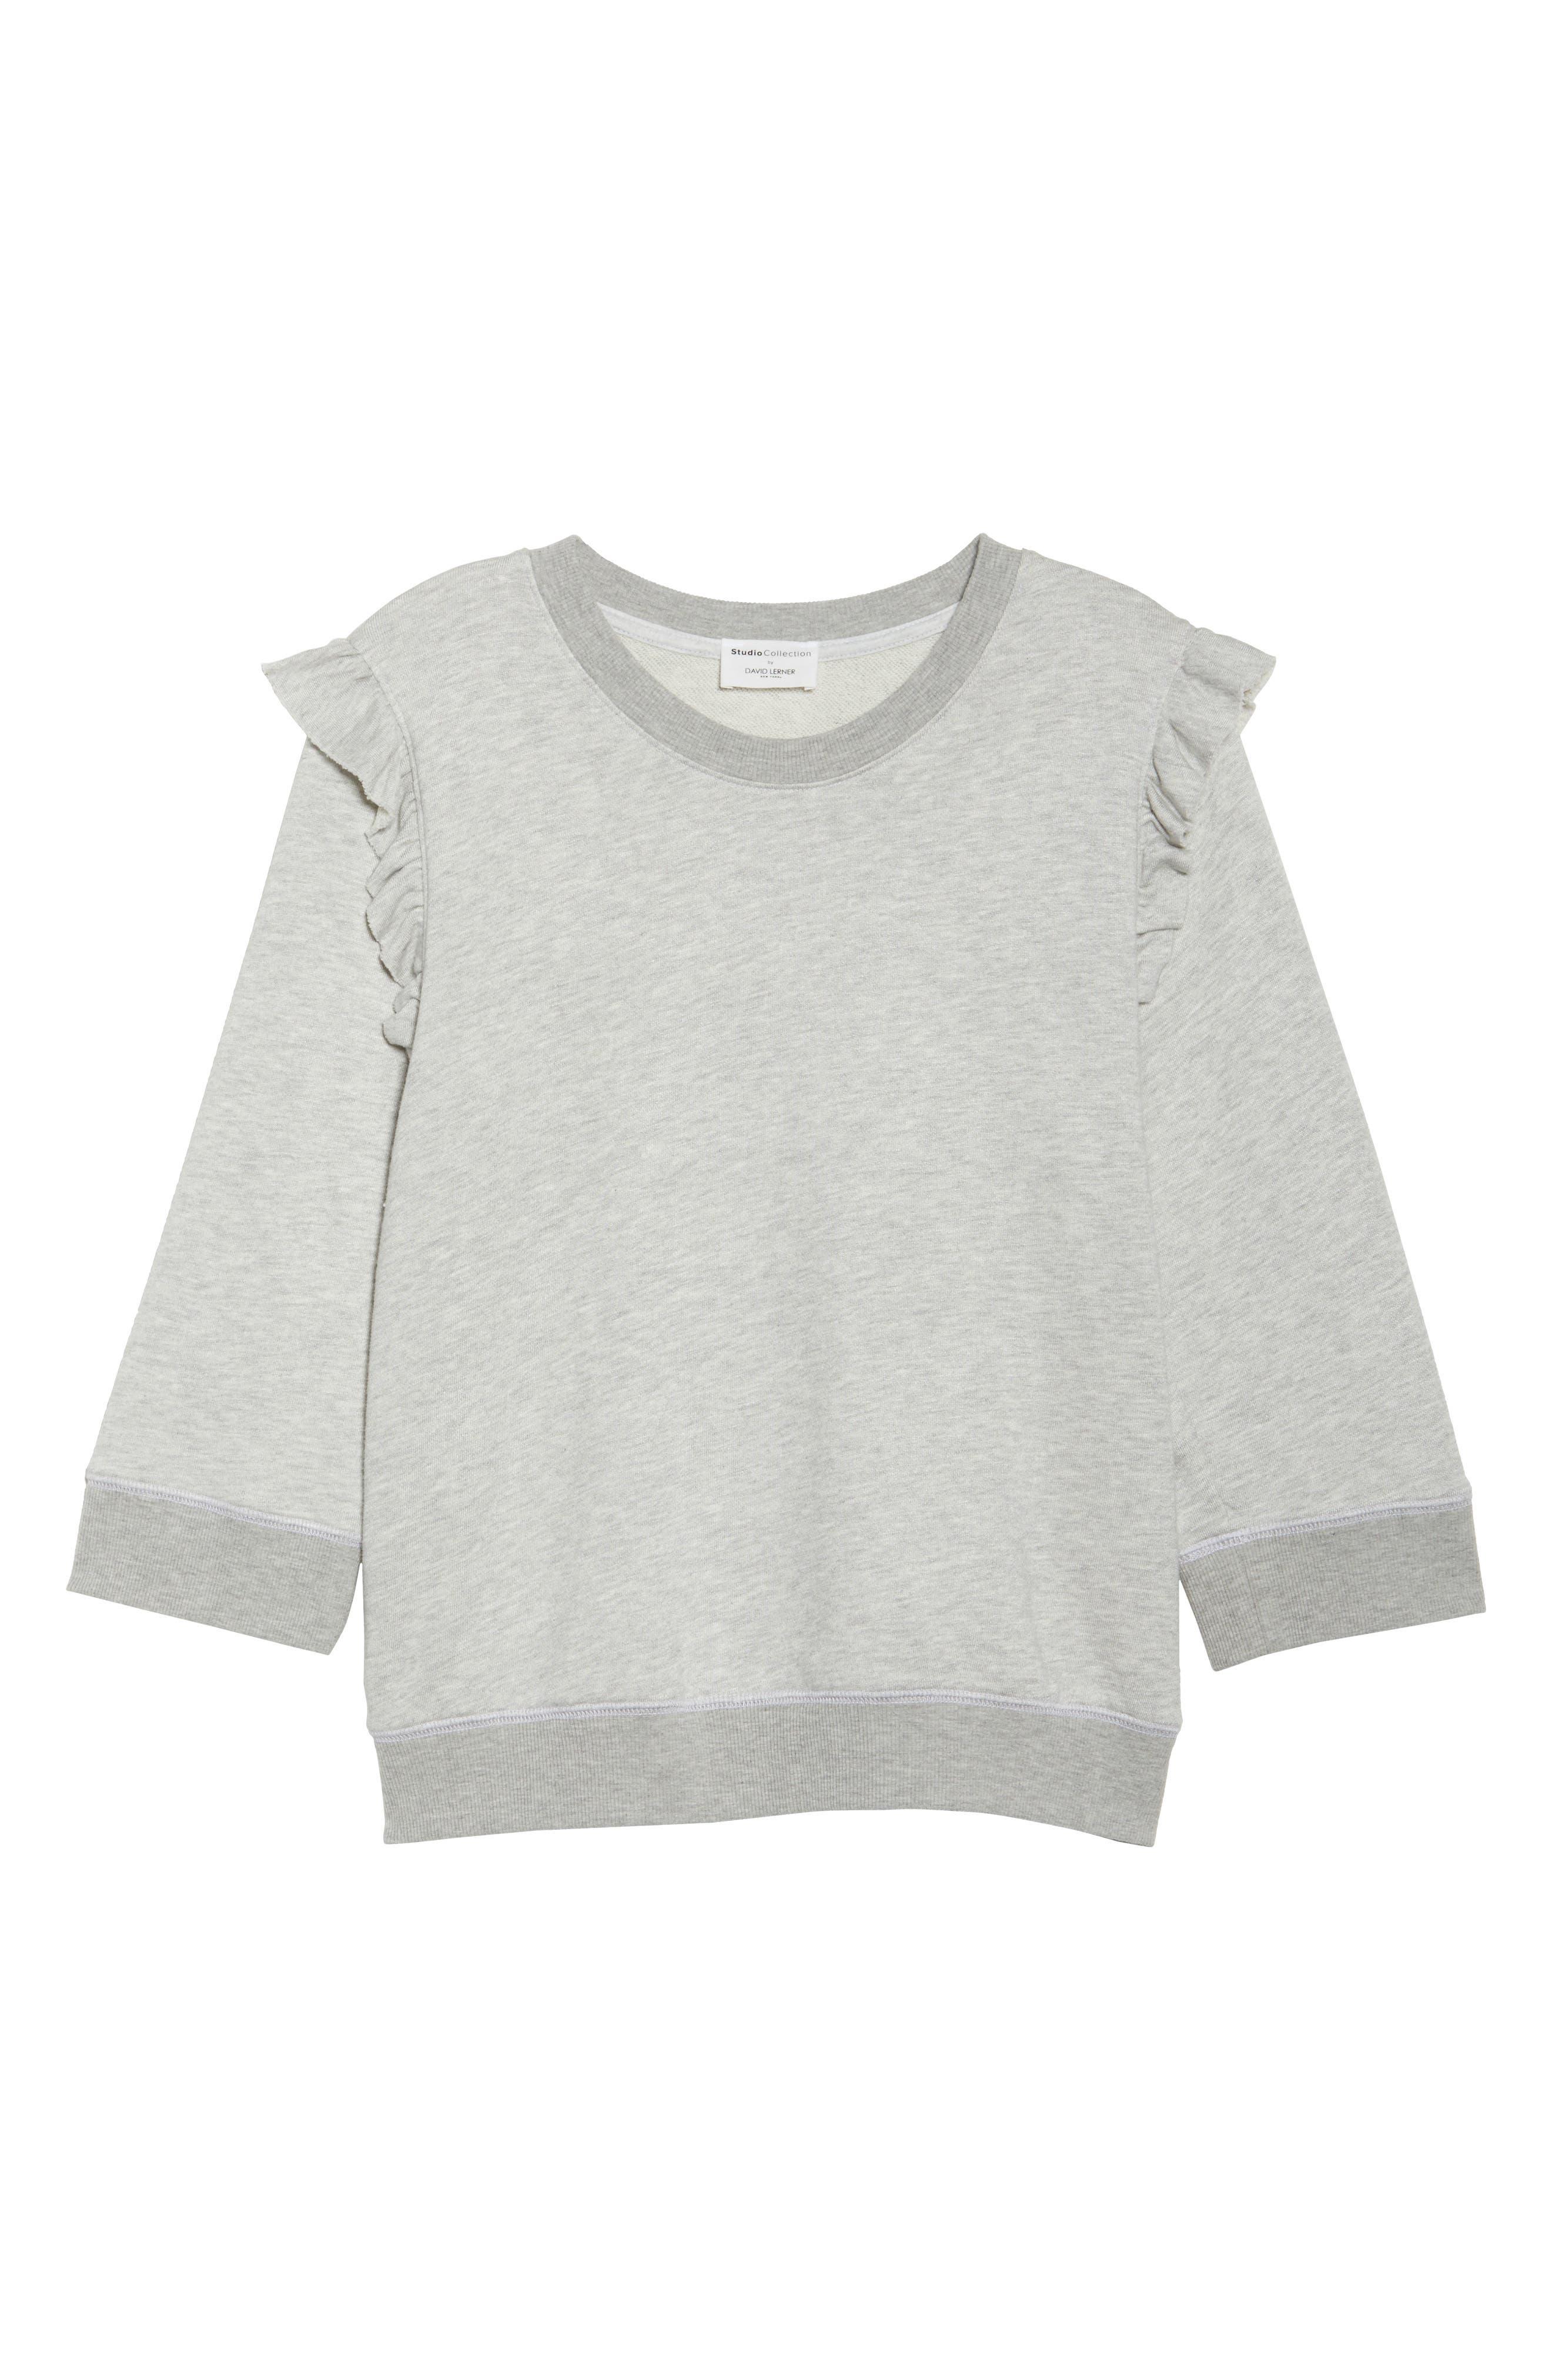 Ruffle Sweatshirt,                             Alternate thumbnail 6, color,                             Heather Grey